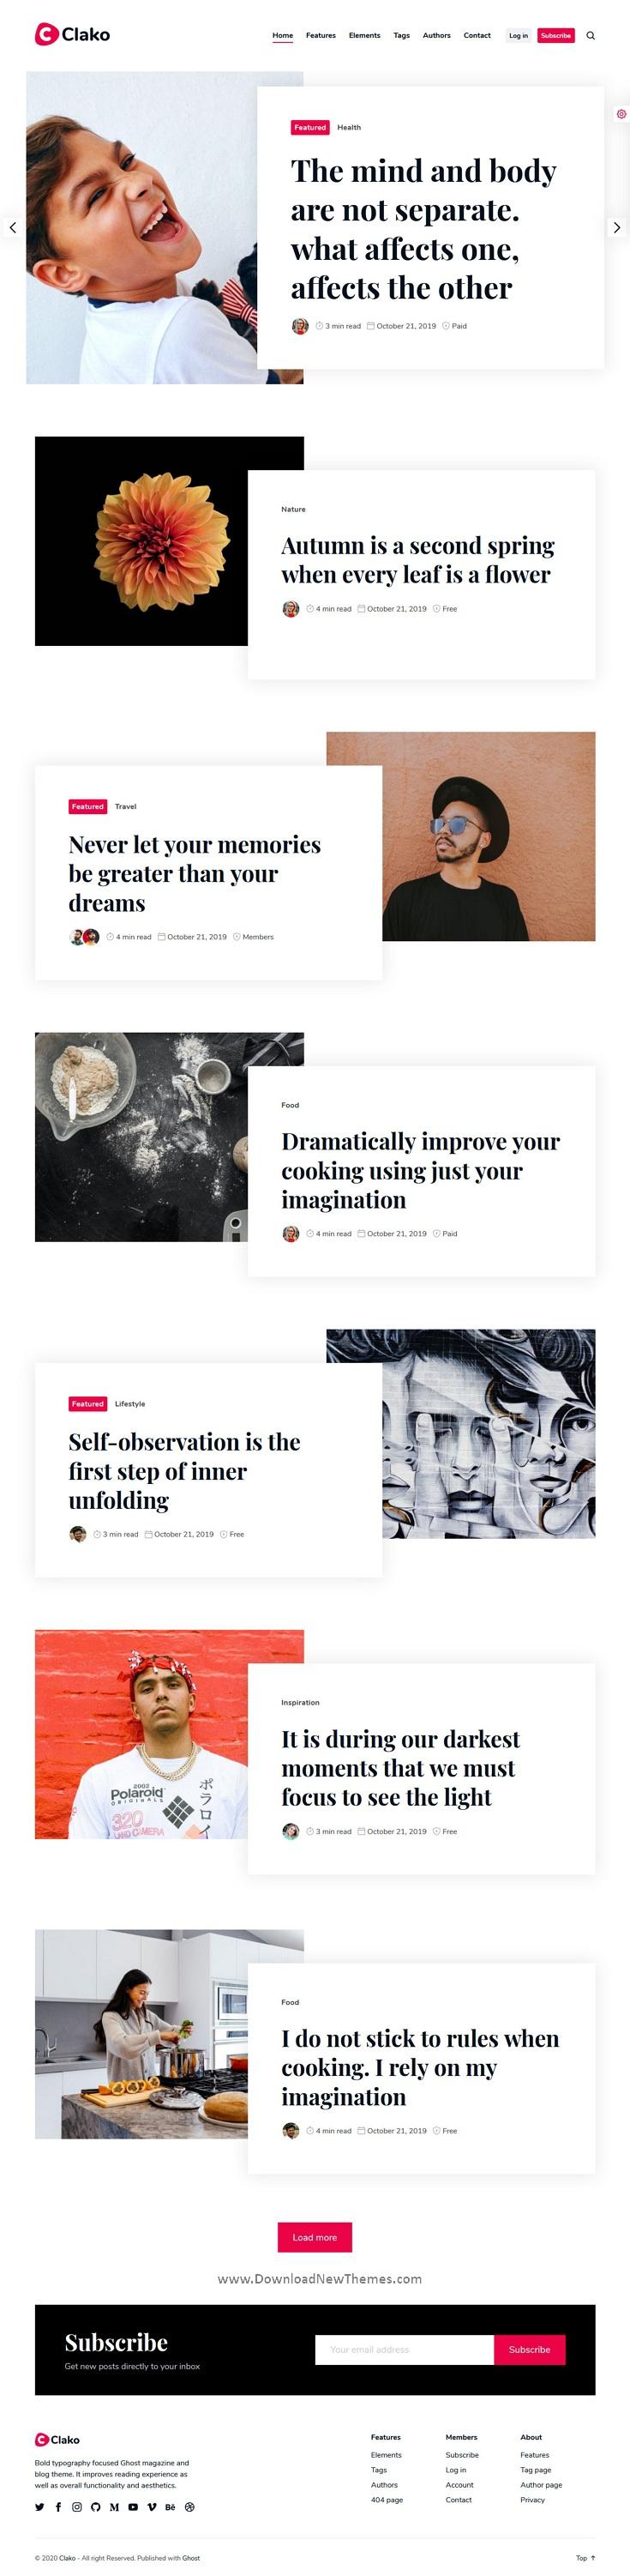 Blog And Magazine Premium Ghost Theme